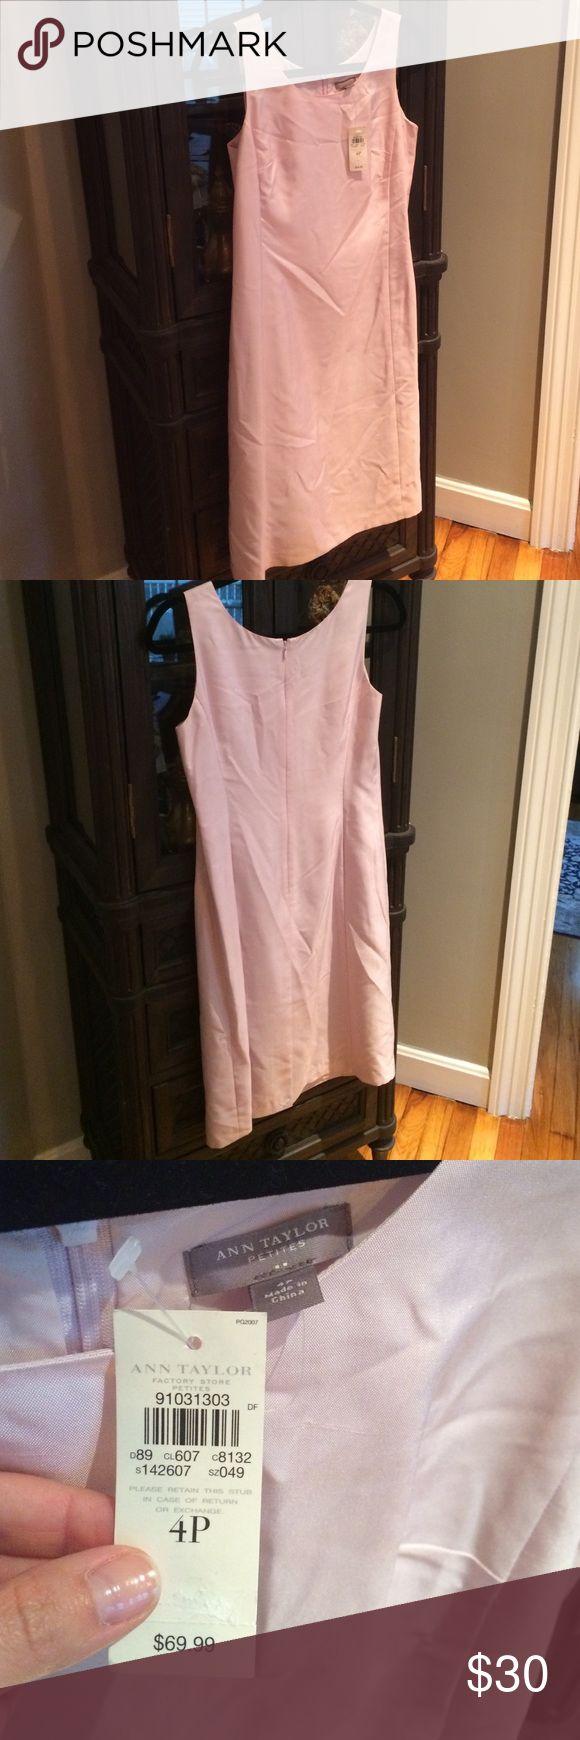 Ann Taylor petite dress Light lavender, pink color, 100% silk, tea length dress.  Never worn, perfect condition! Ann Taylor Dresses Midi